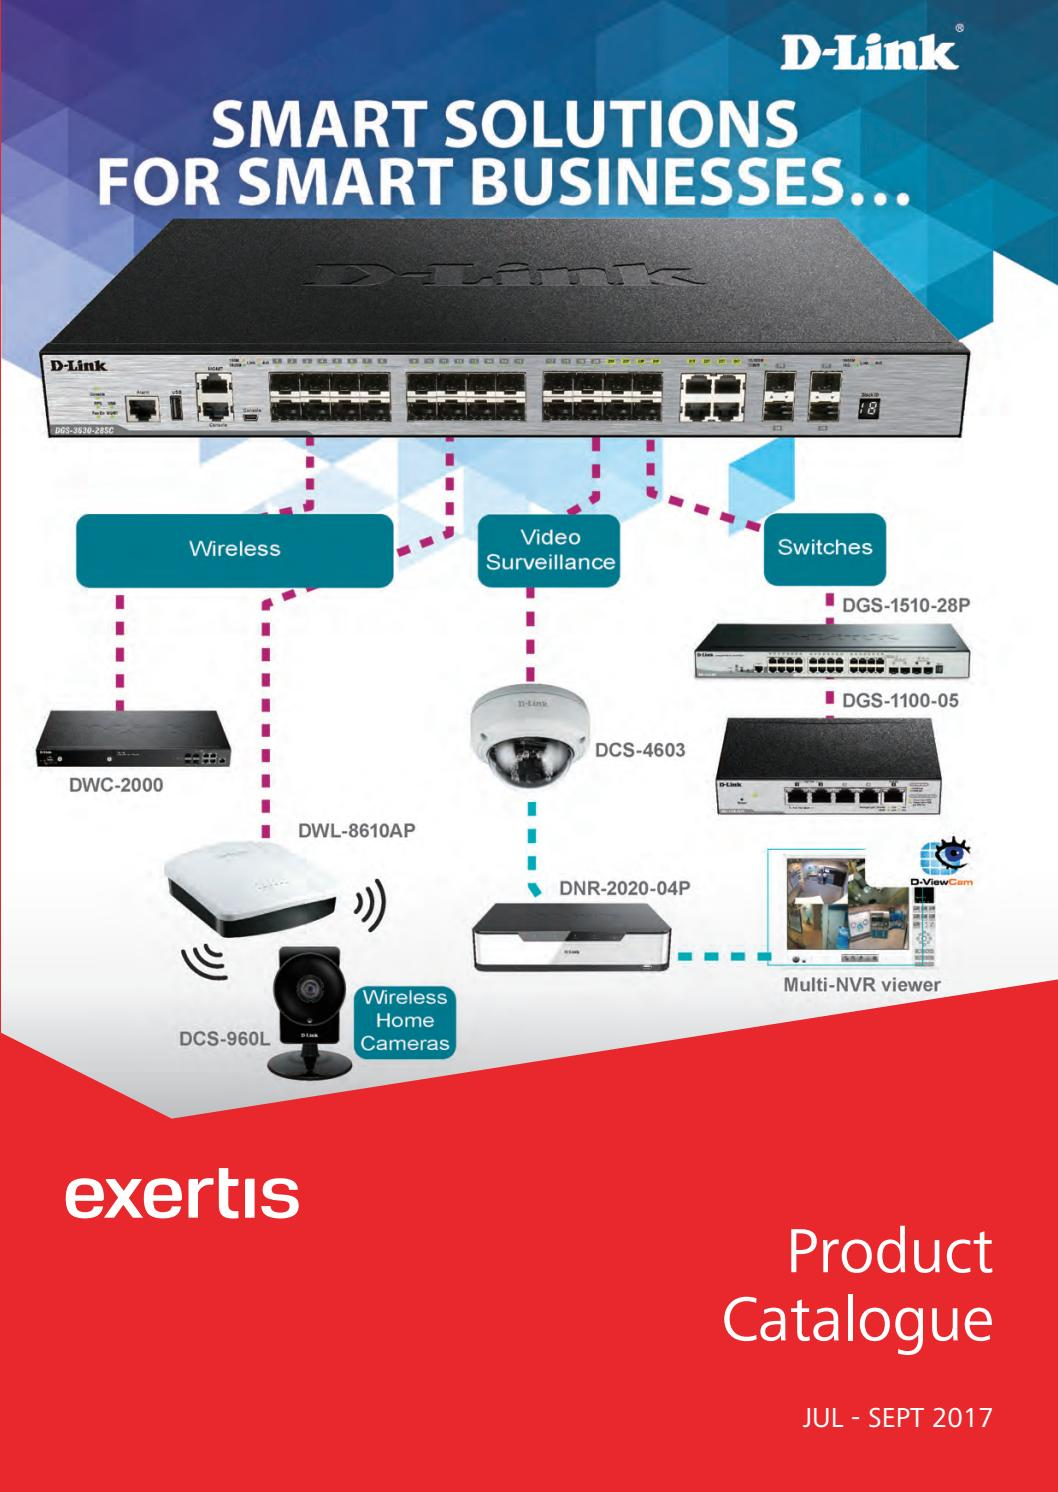 Product Catalogue By Exertismarketing Issuu 700 Power Driver Ridgid 230v 41940